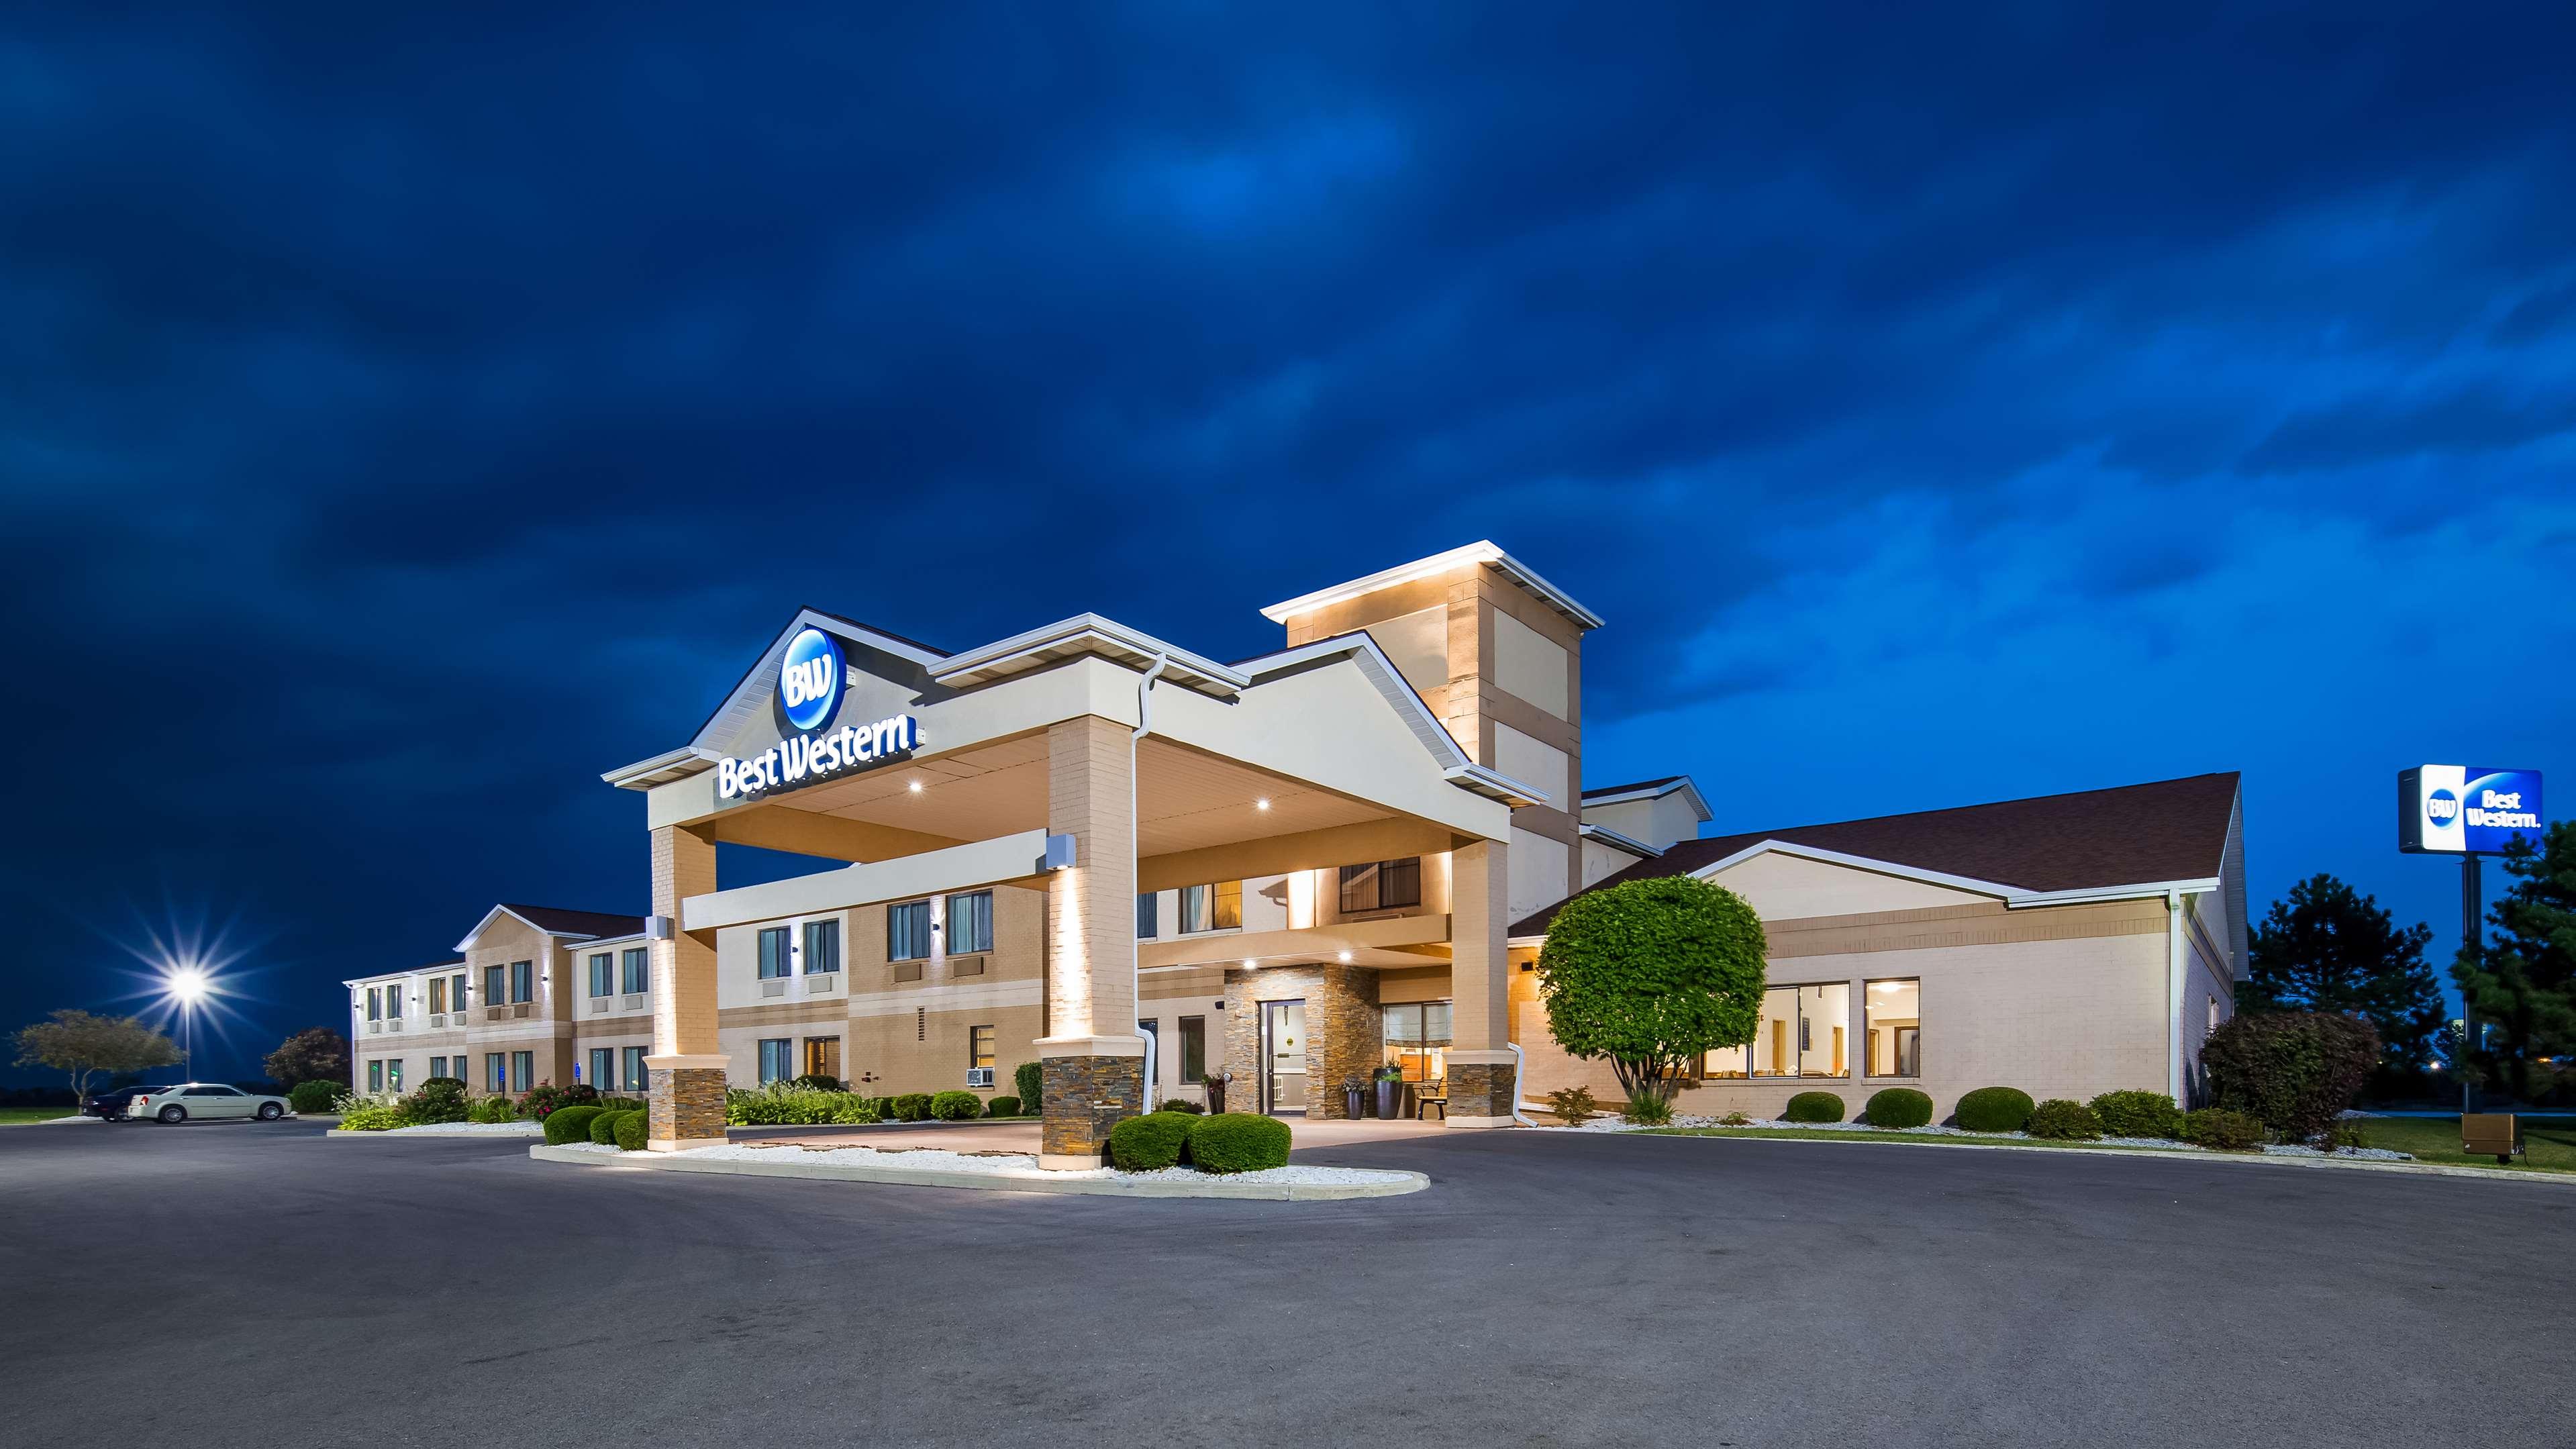 Casino near celina ohio